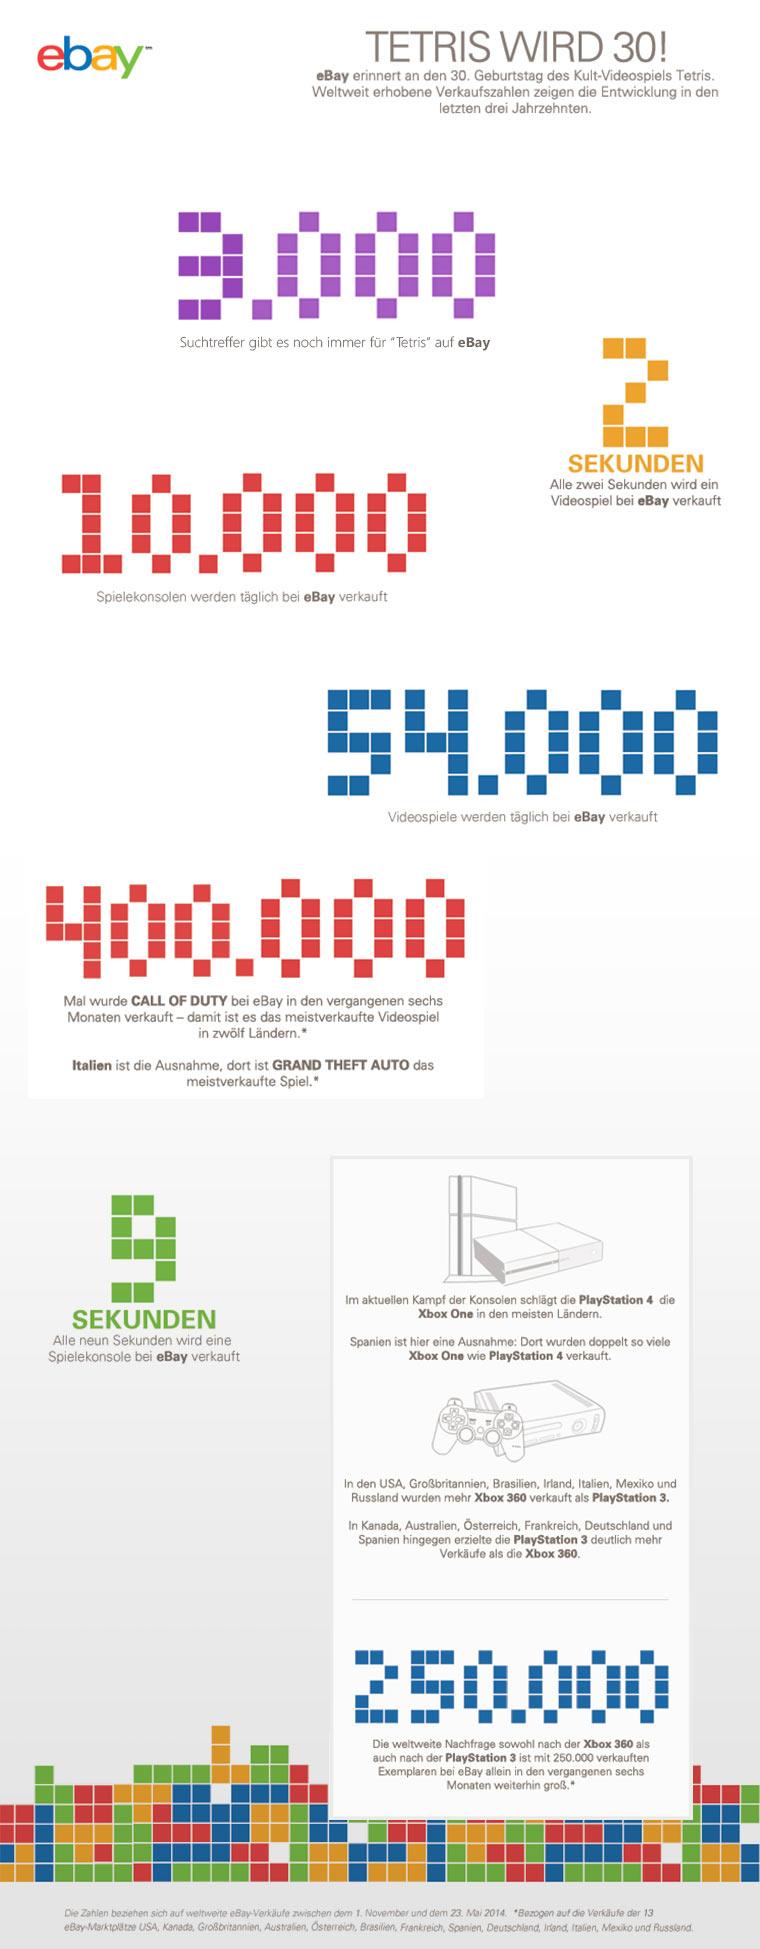 30 Jahre Tetris - eBay gratuliert! eBay_Tetris_02